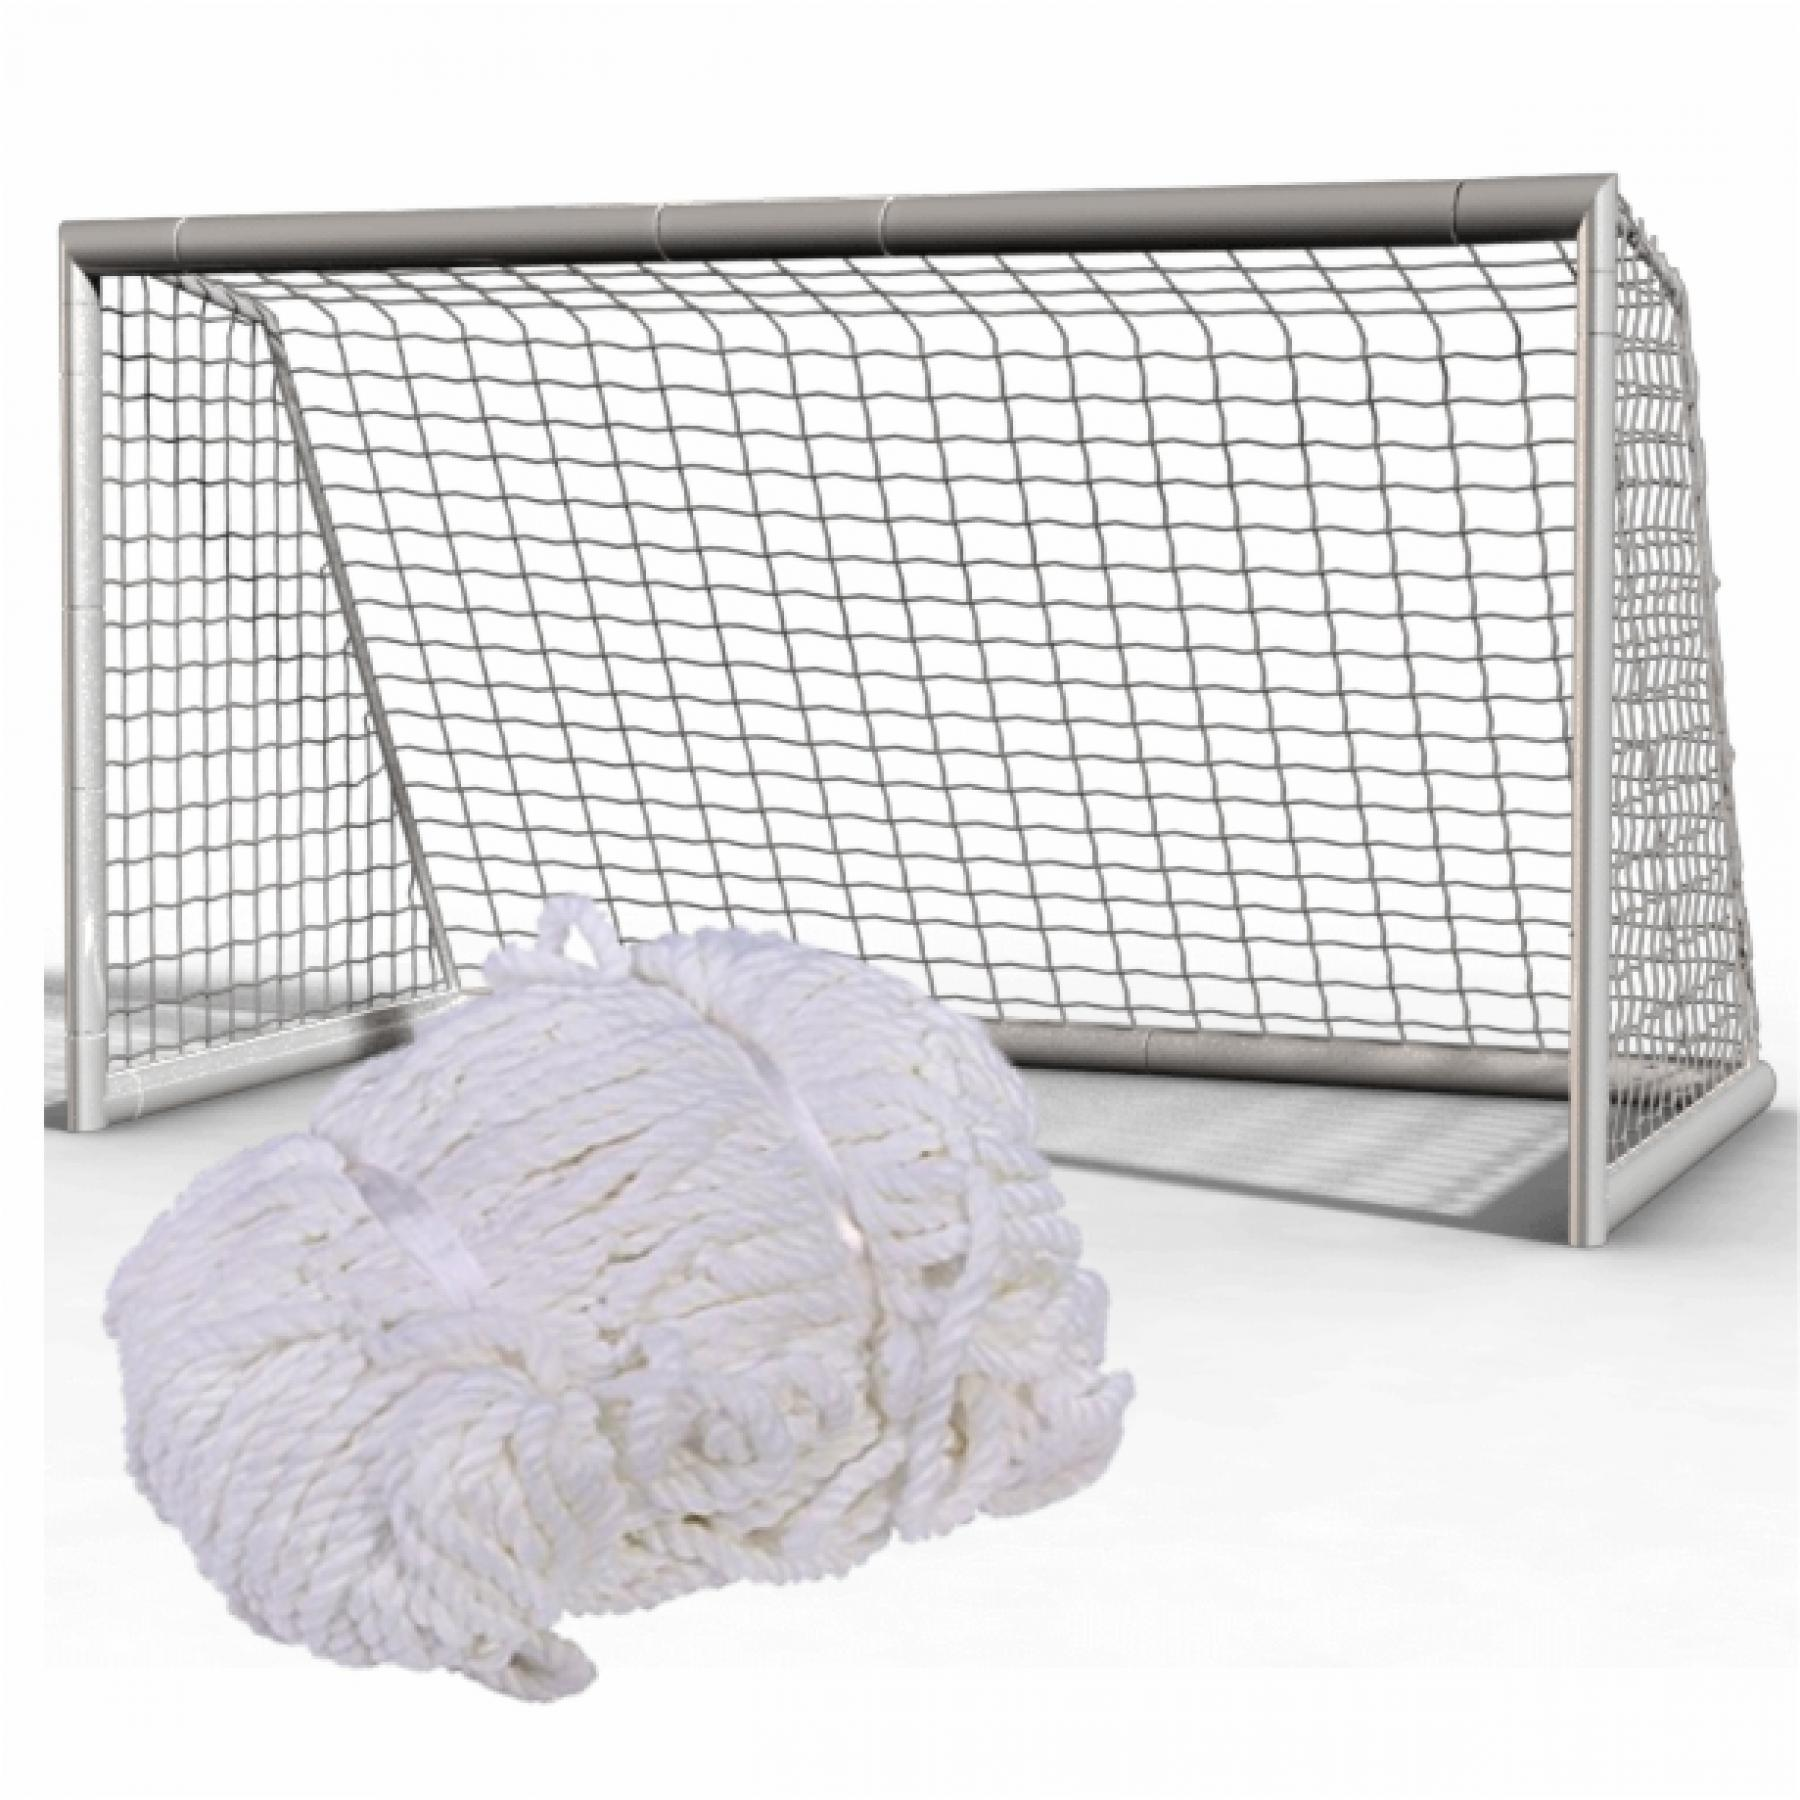 Hockey Goals & Nets